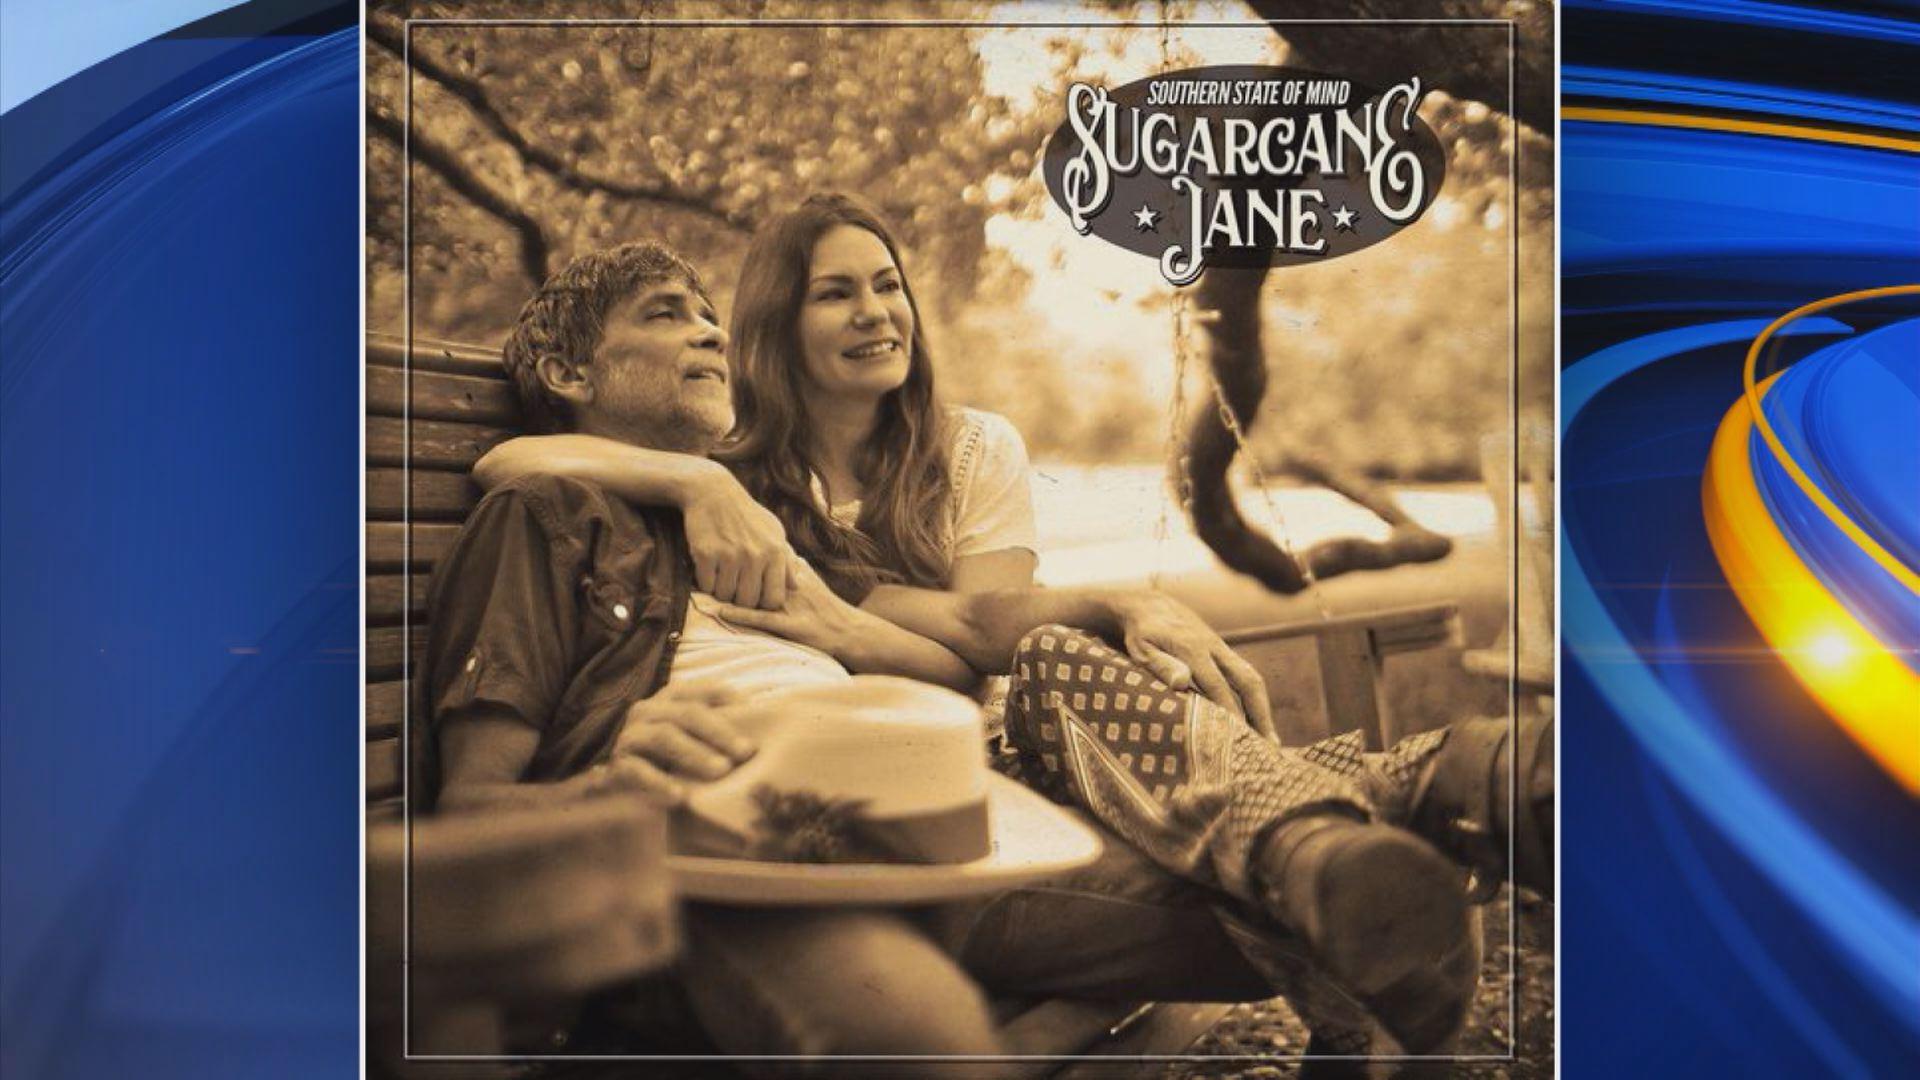 NEXSTAR-sugarcane-jane-southern-state-of-mind-cover-cd_1539973322679.jpeg